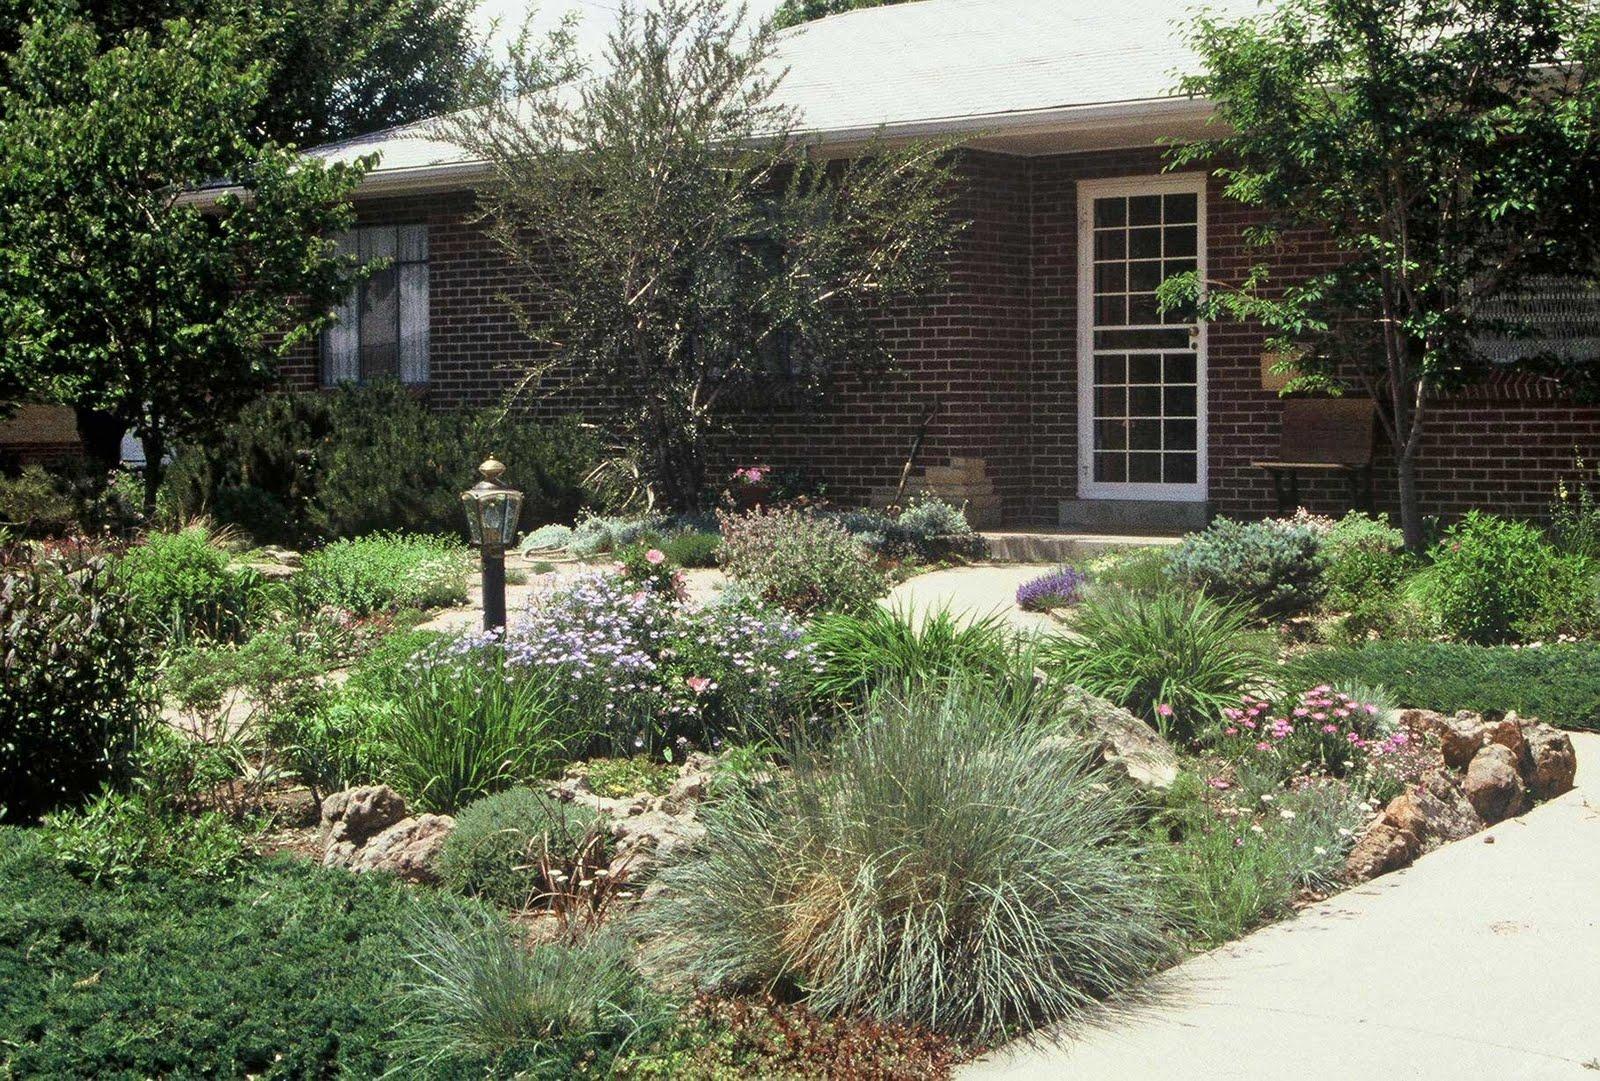 the art garden: Garden Designers Roundtable: Lawn Alternatives on No Grass Garden Ideas  id=76712